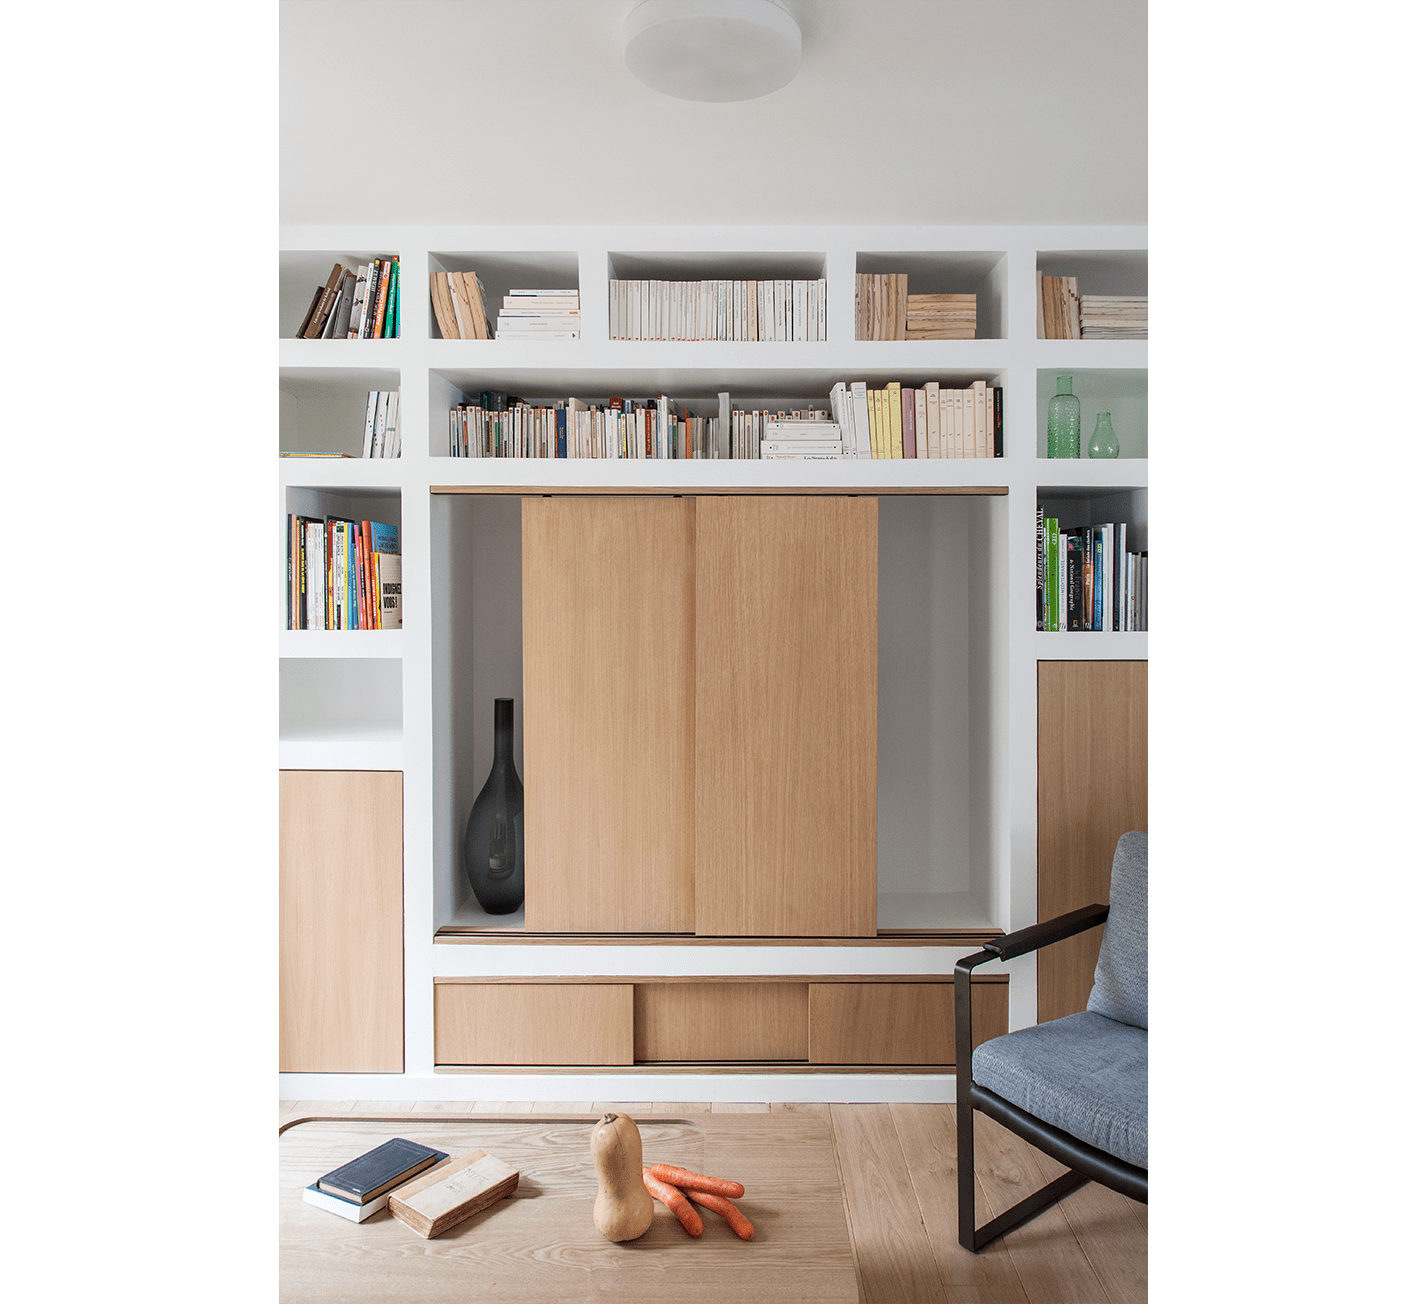 Projet-Germaine-Atelier-Steve-Pauline-Borgia-Architecte-interieur-12-min